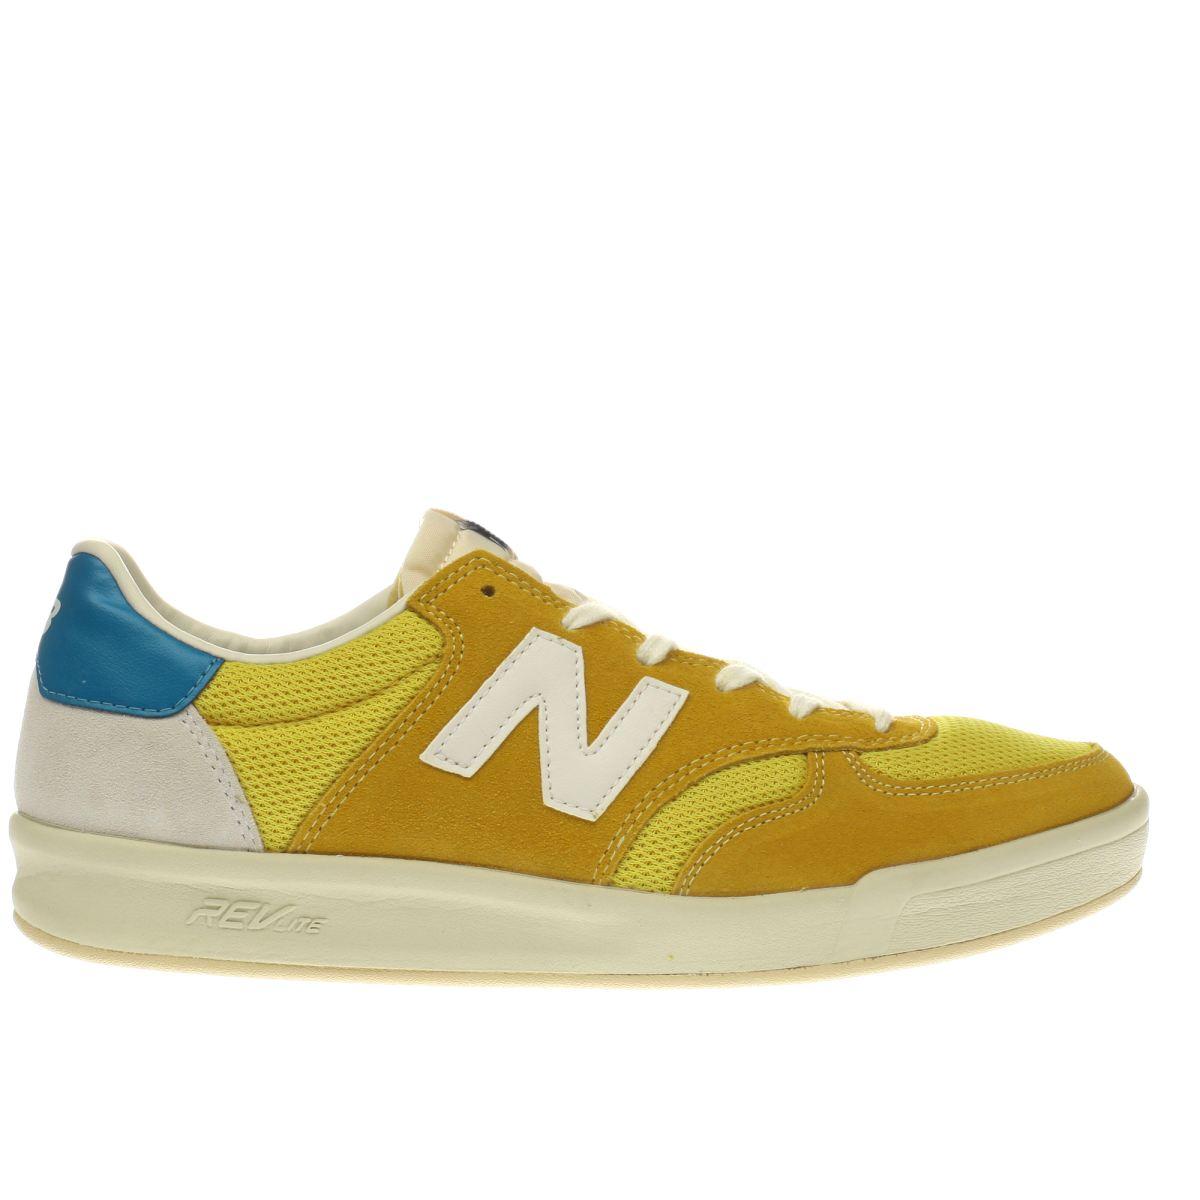 new balance yellow 300 trainers